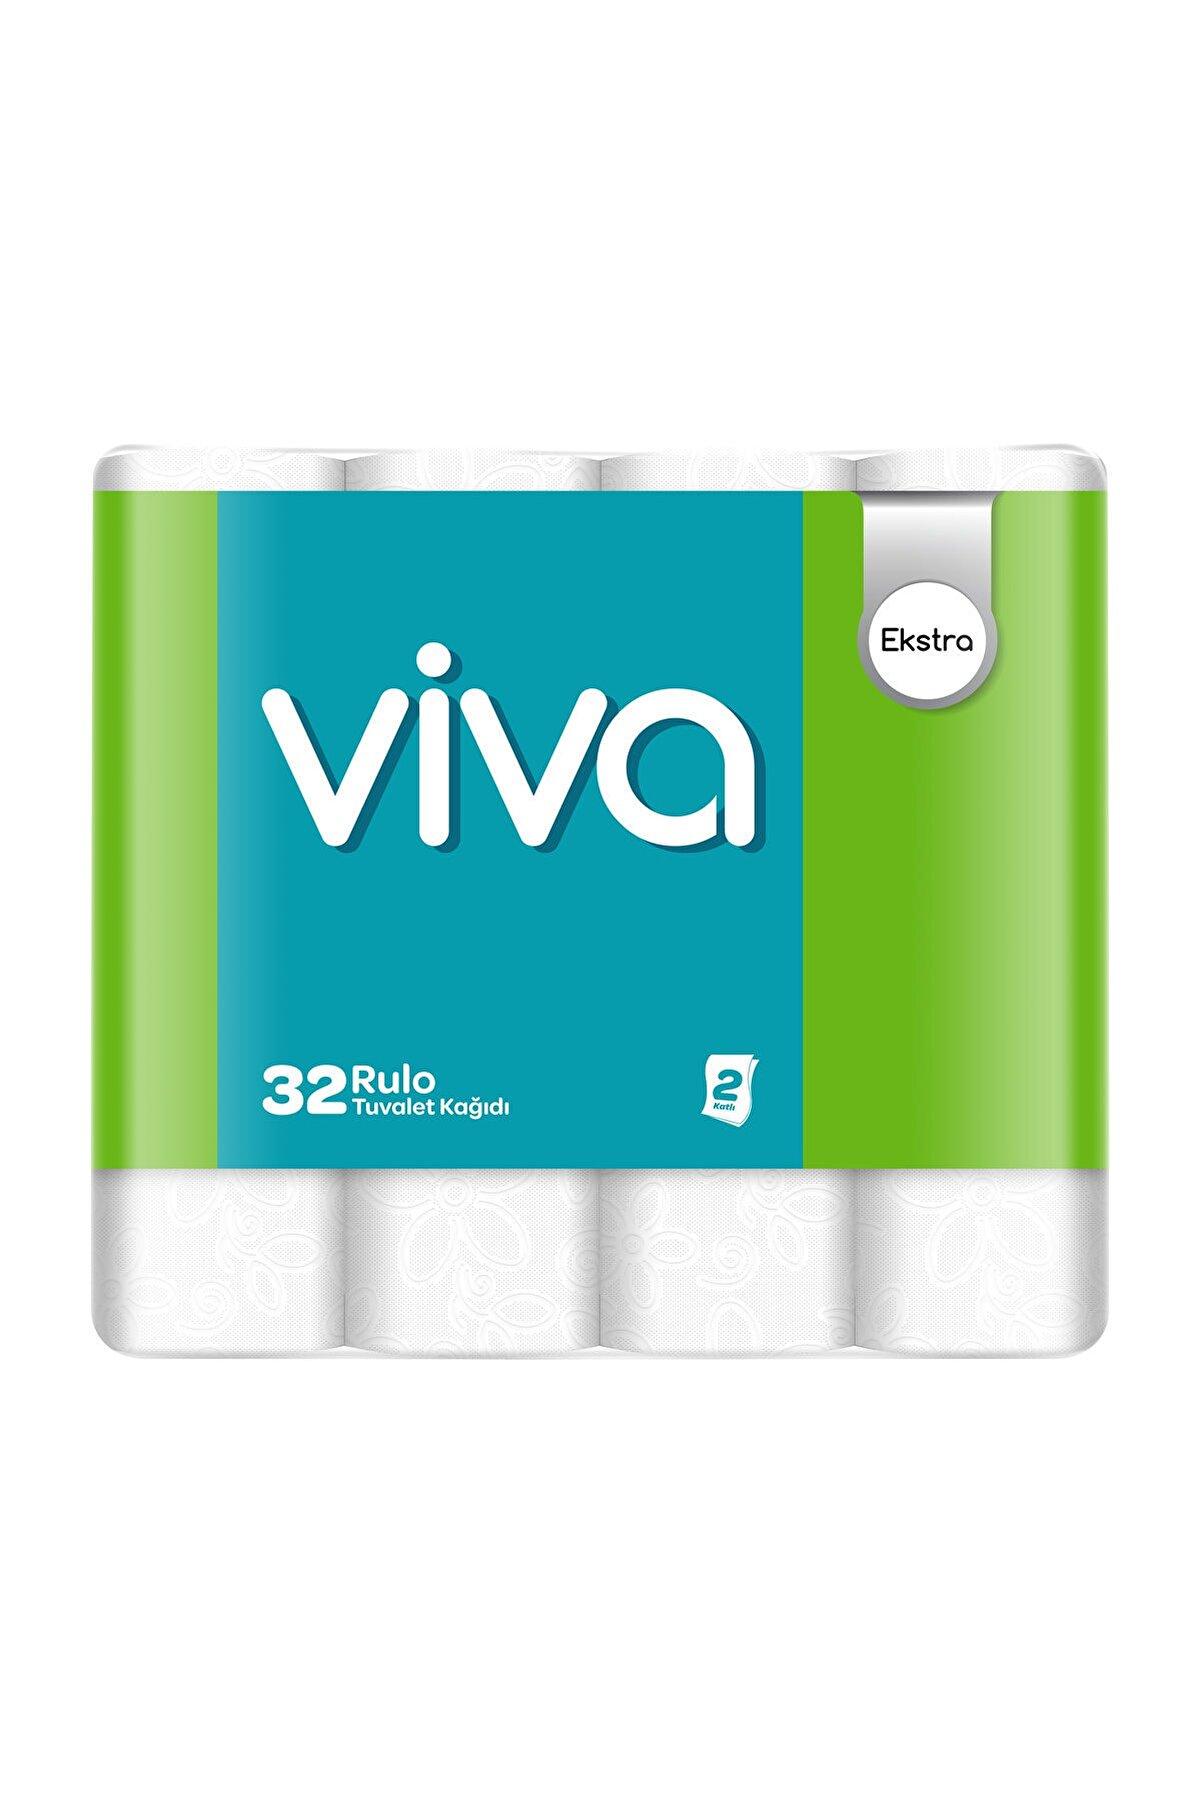 Viva Tuvalet Kağıdı 32'li